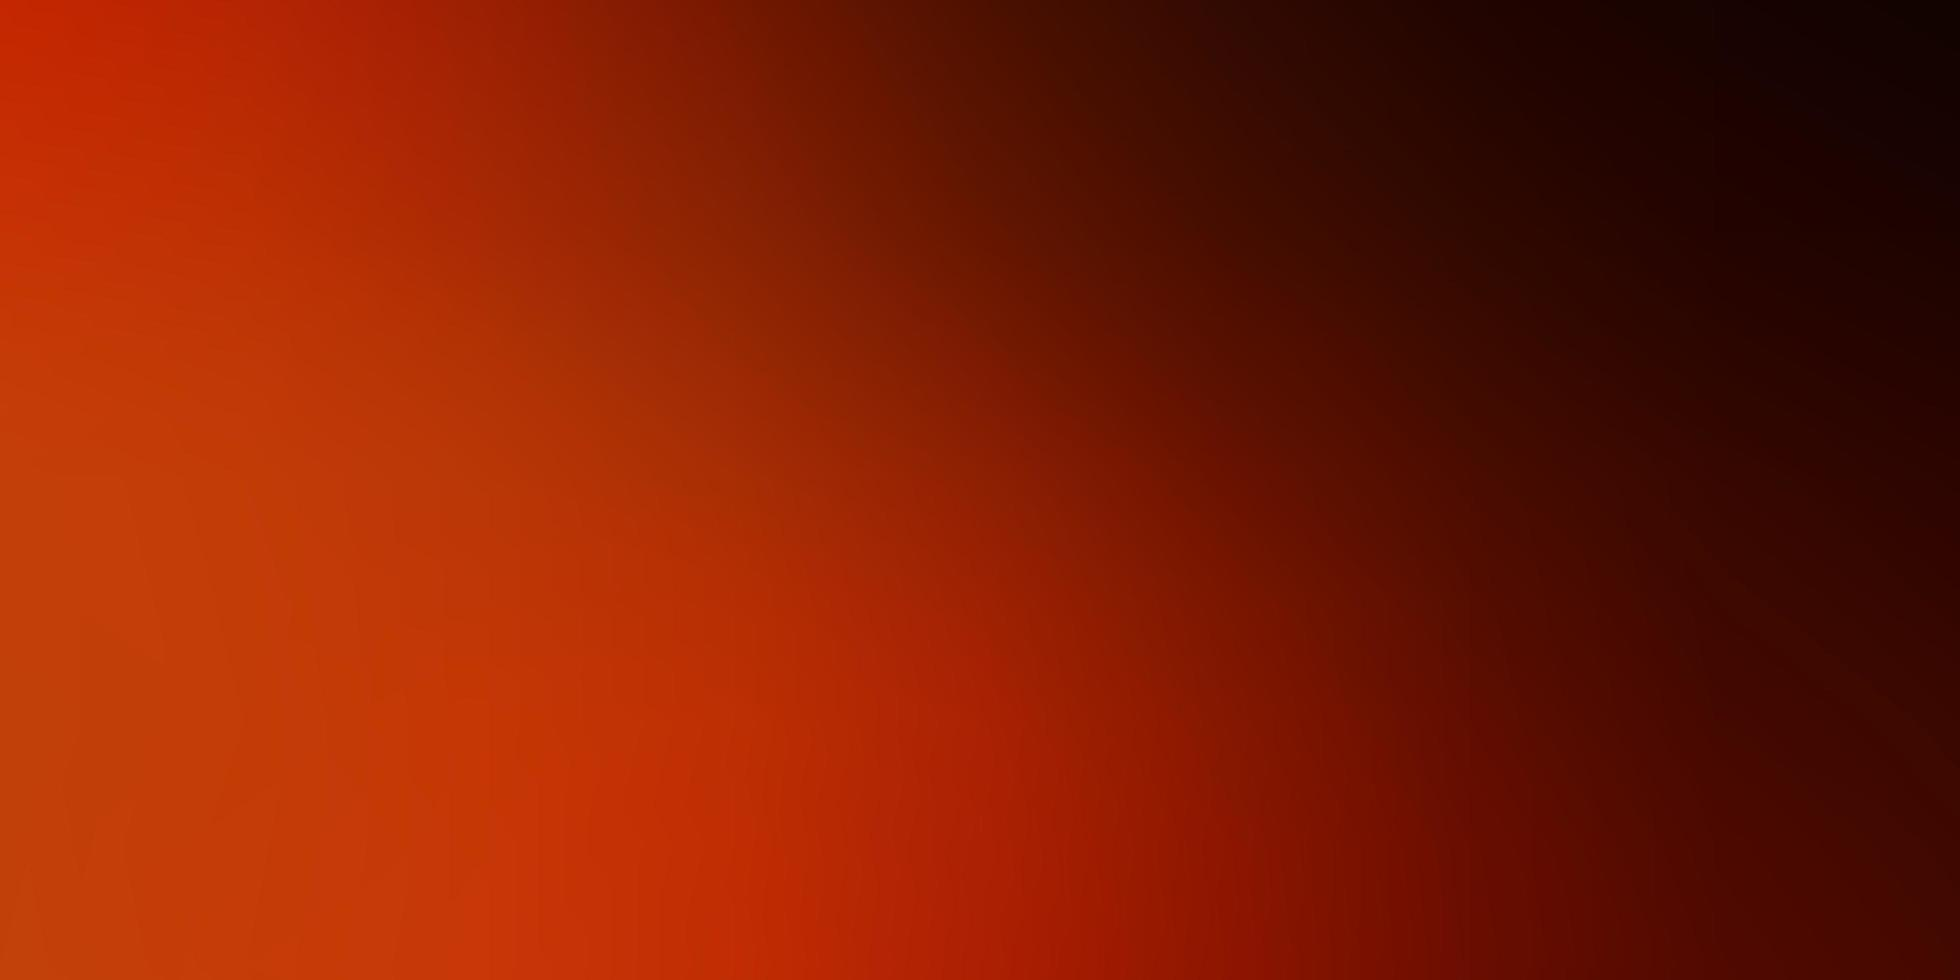 vetor laranja escuro turva fundo colorido.